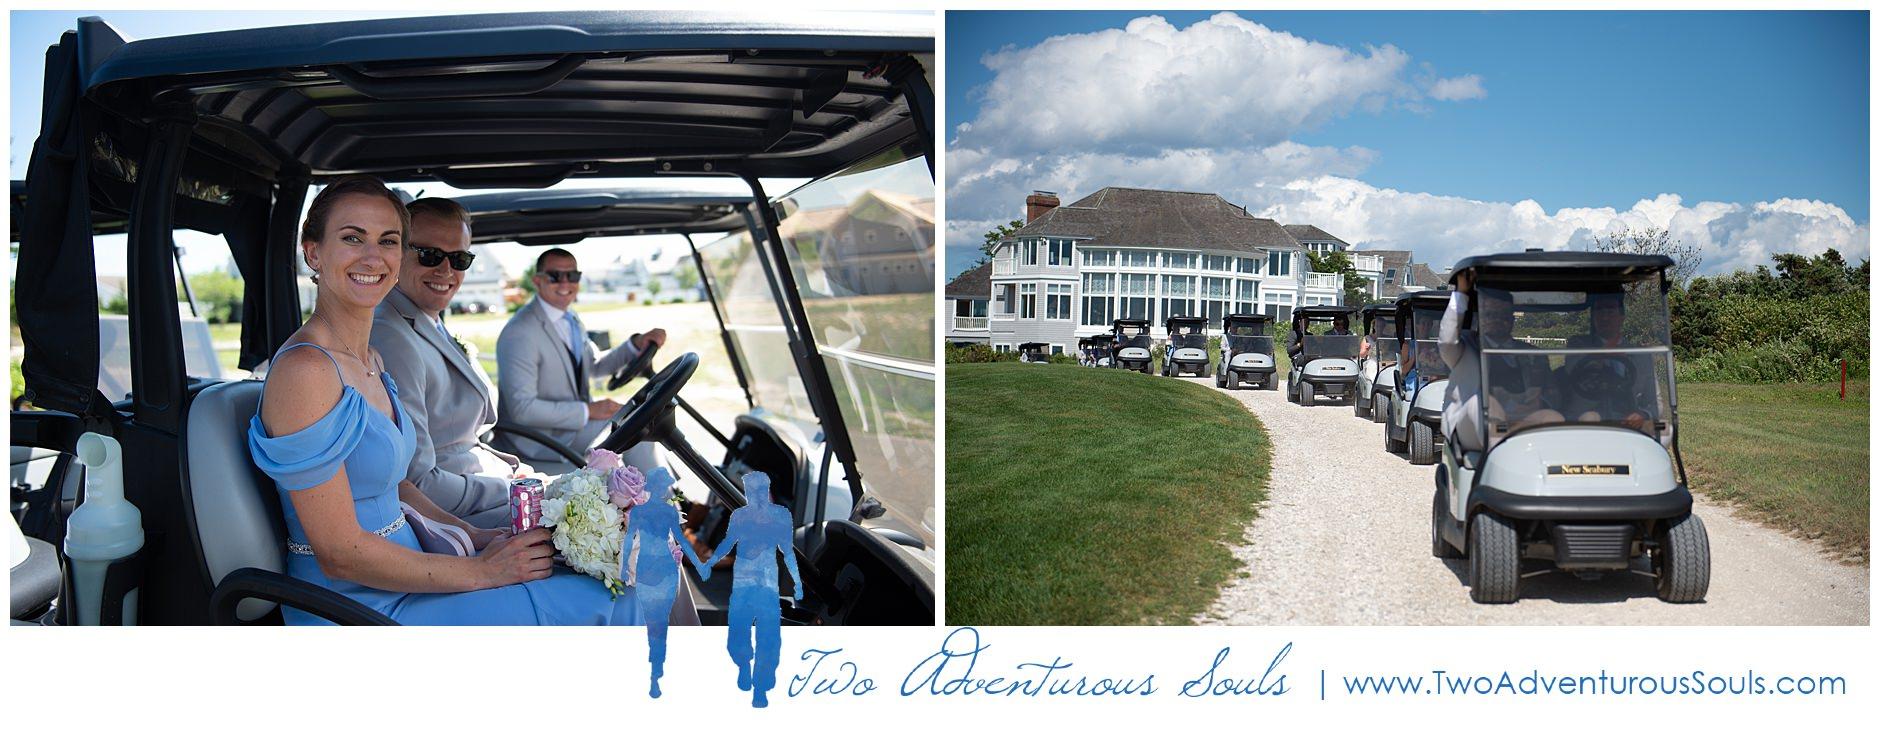 Cape Cod Wedding Photographers, Destination Wedding Photographers, Two Adventurous Souls-081019_0028.jpg